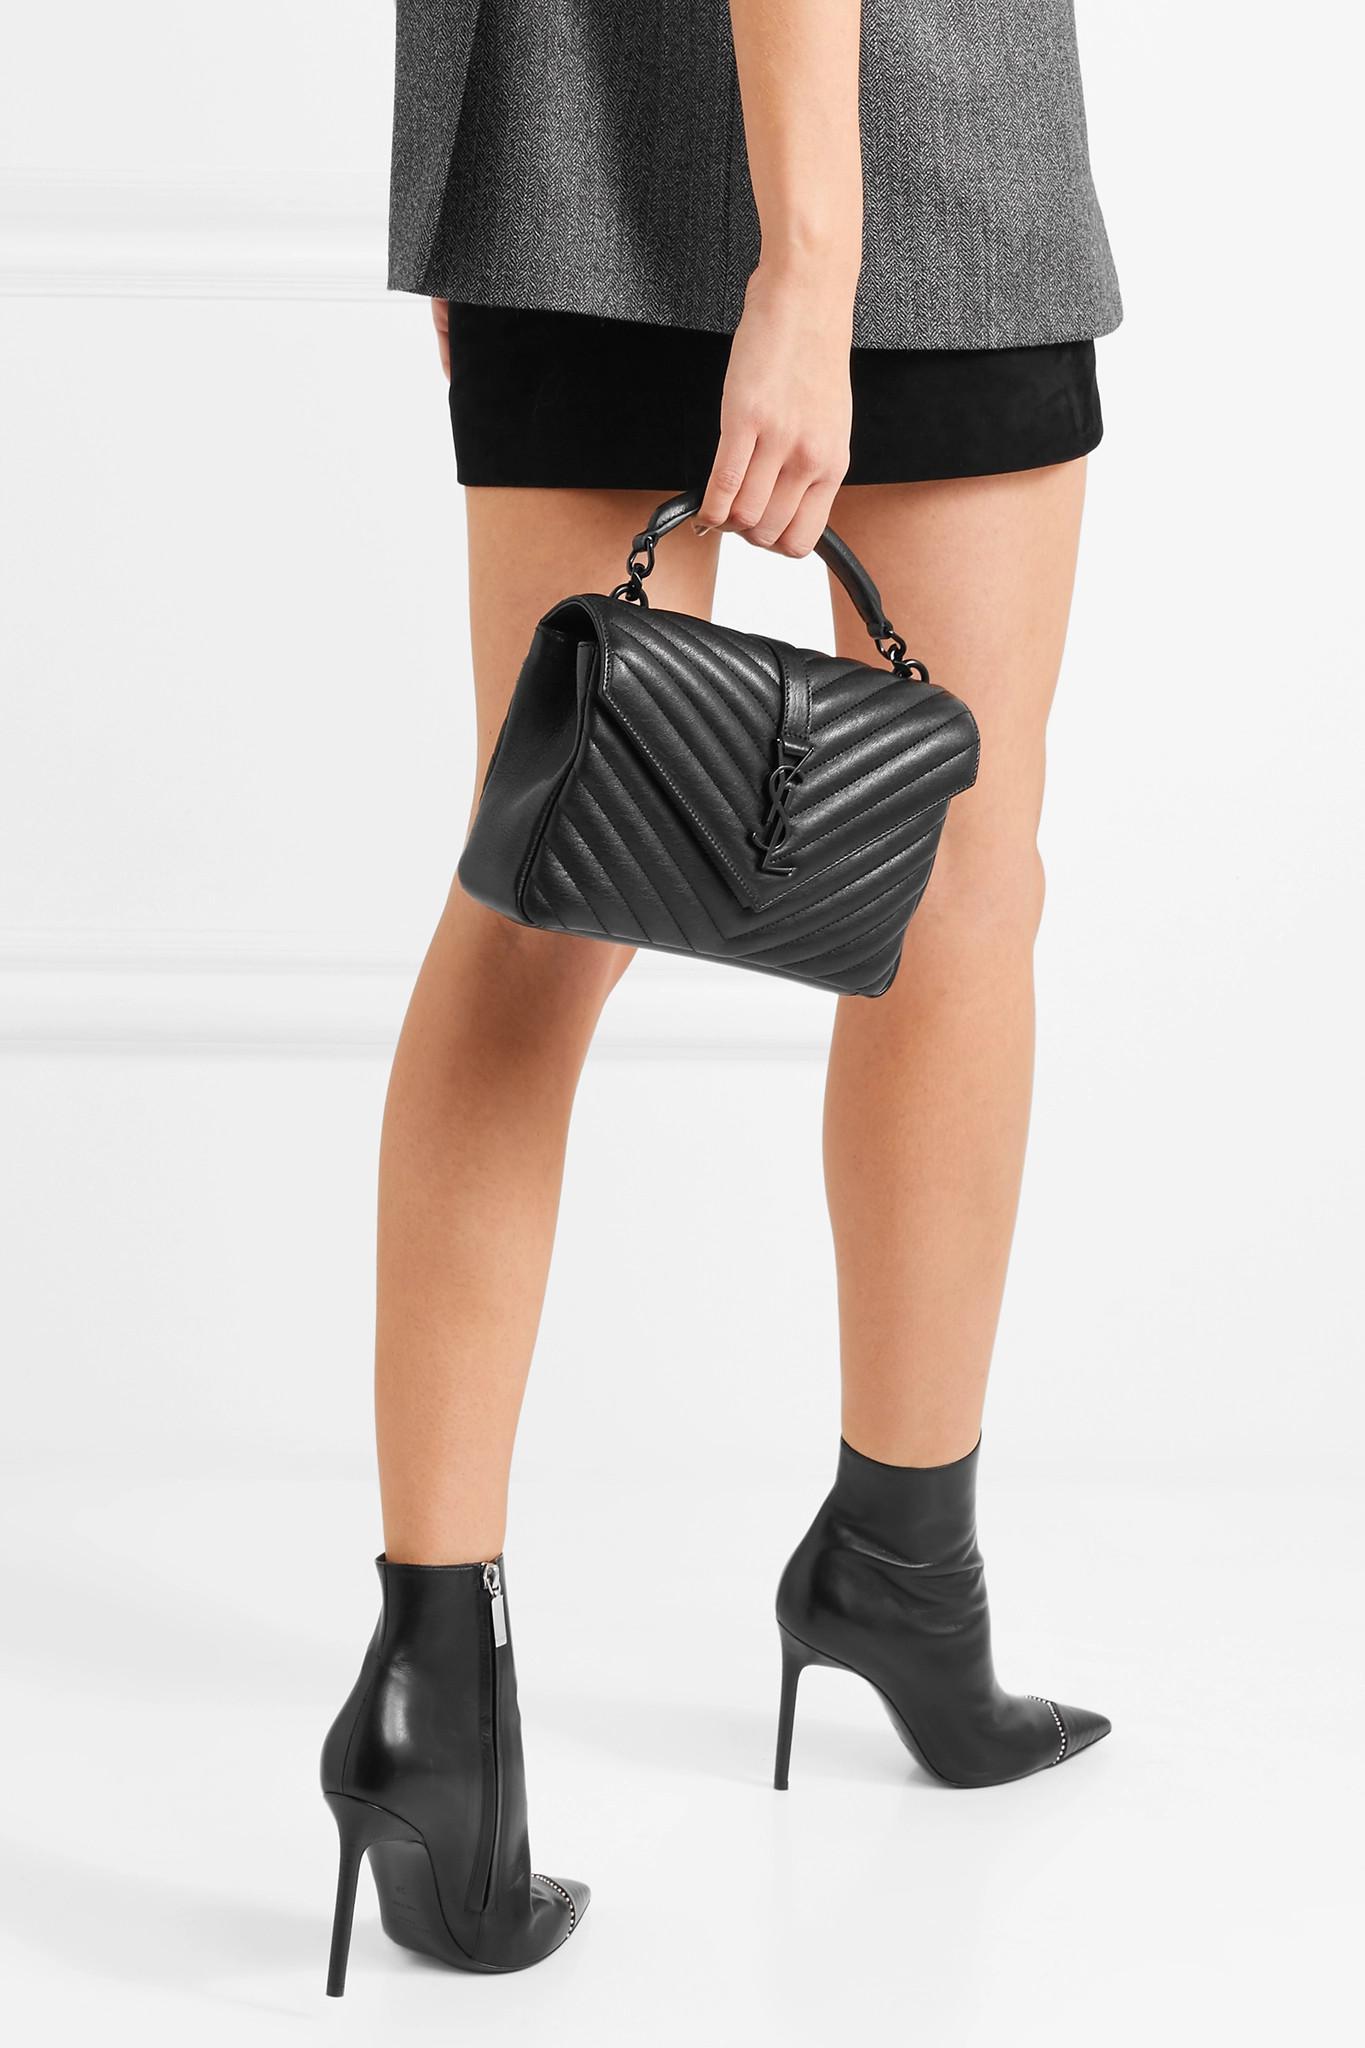 2a02f6216ac3 Saint Laurent - Black College Medium Quilted Leather Shoulder Bag - Lyst.  View fullscreen